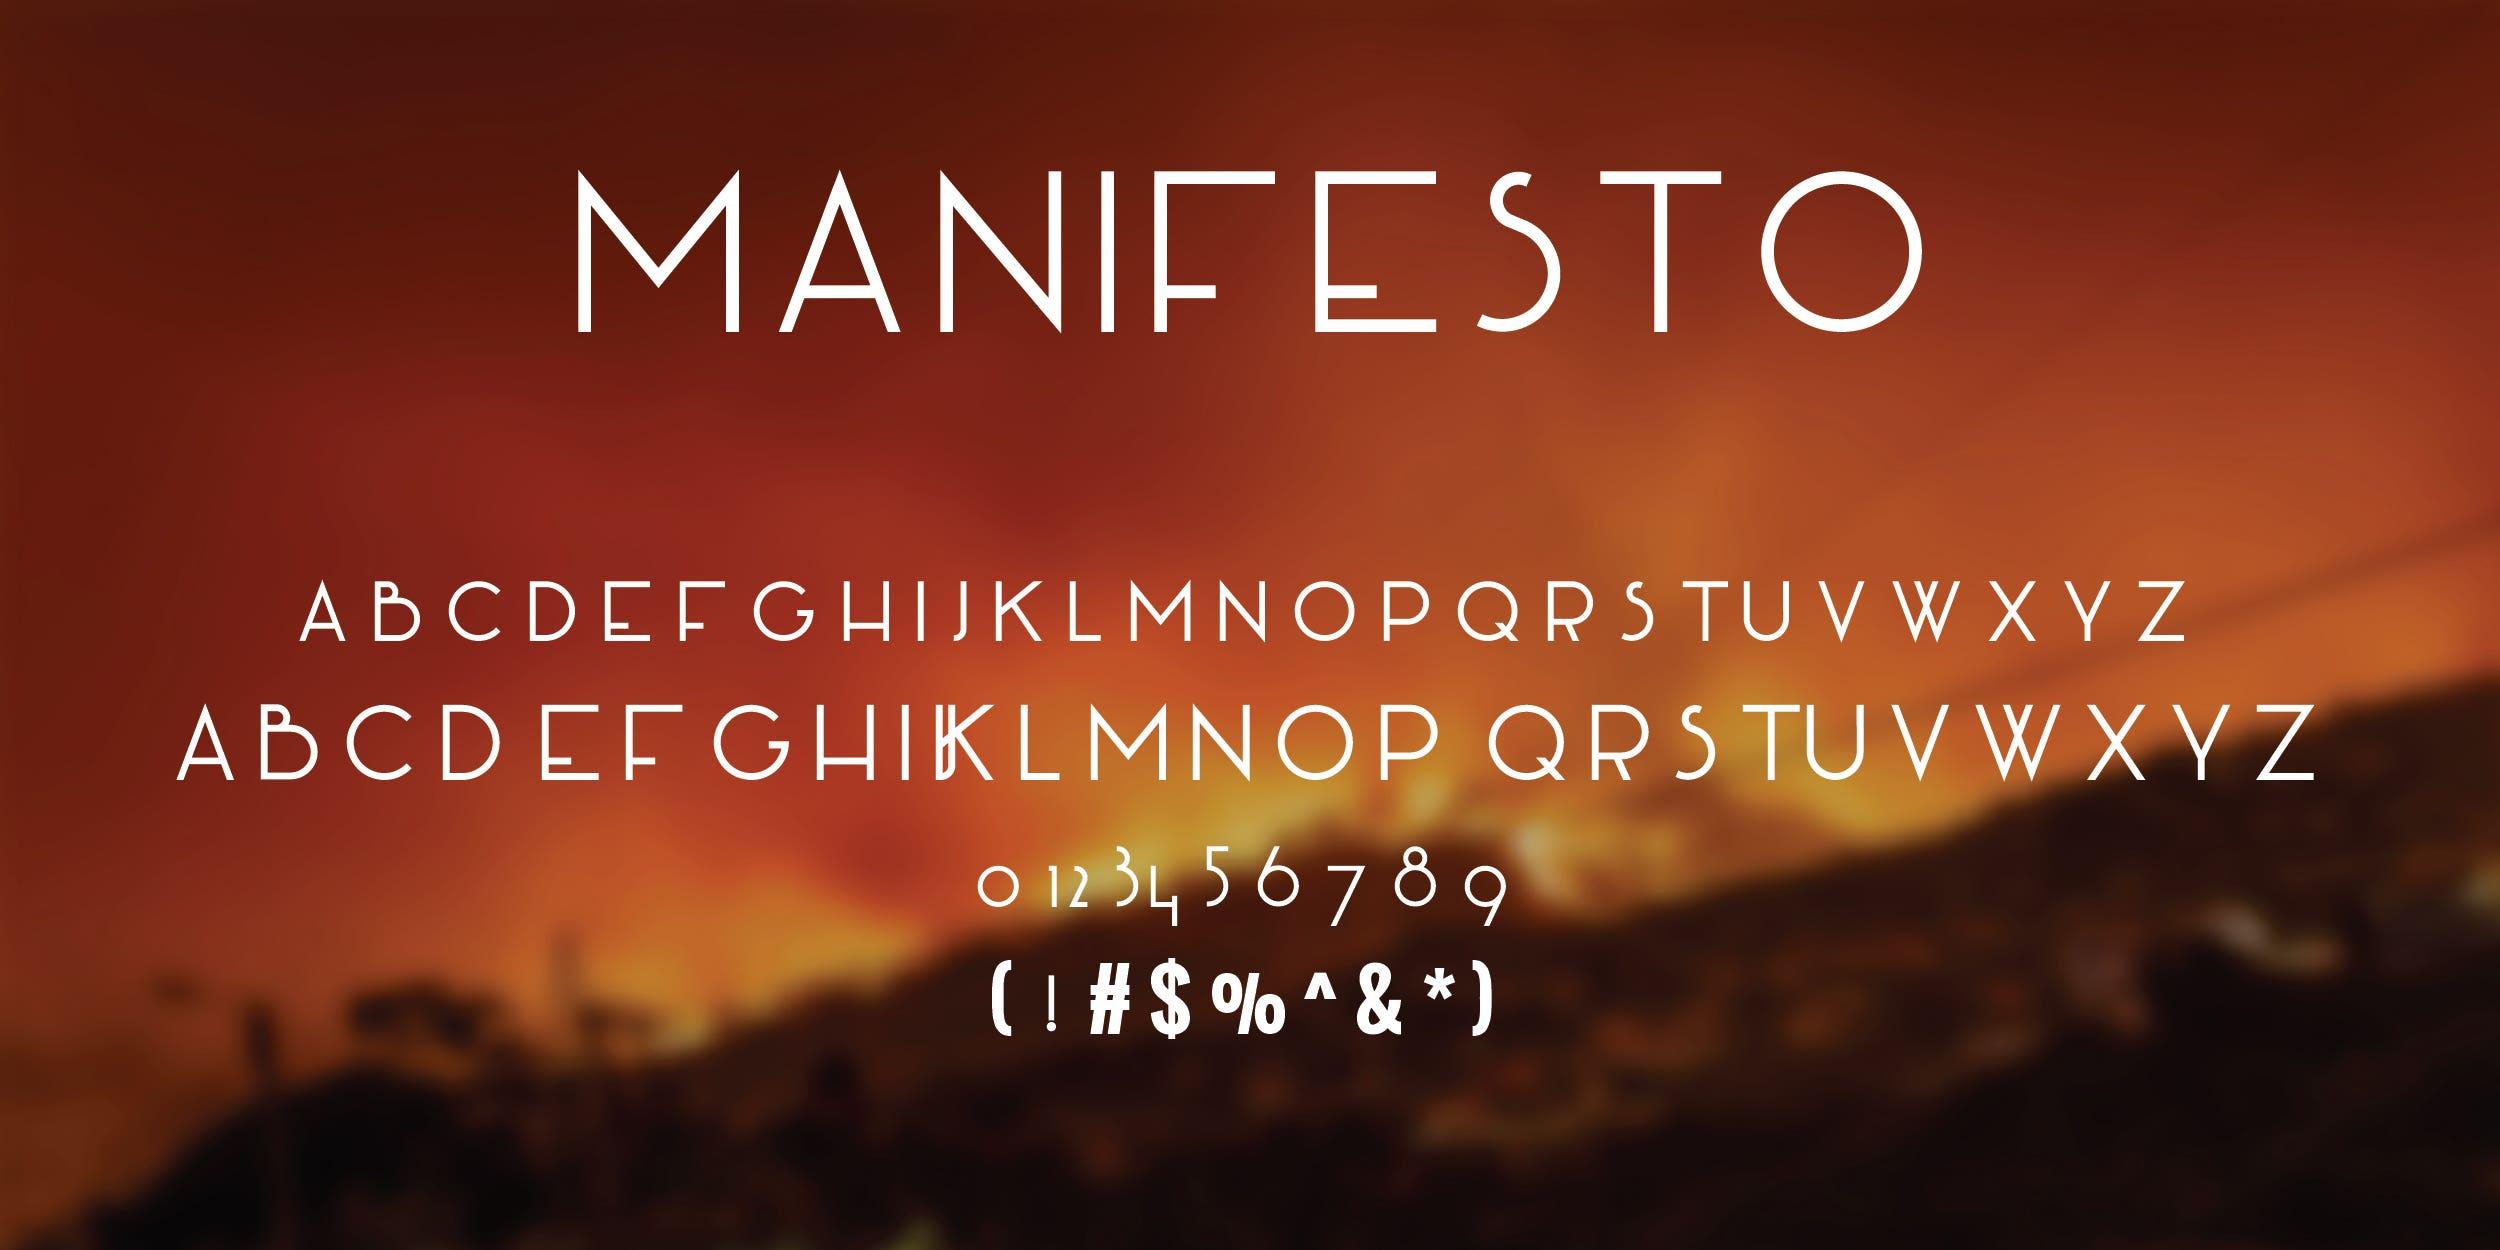 Manifesto Free Font